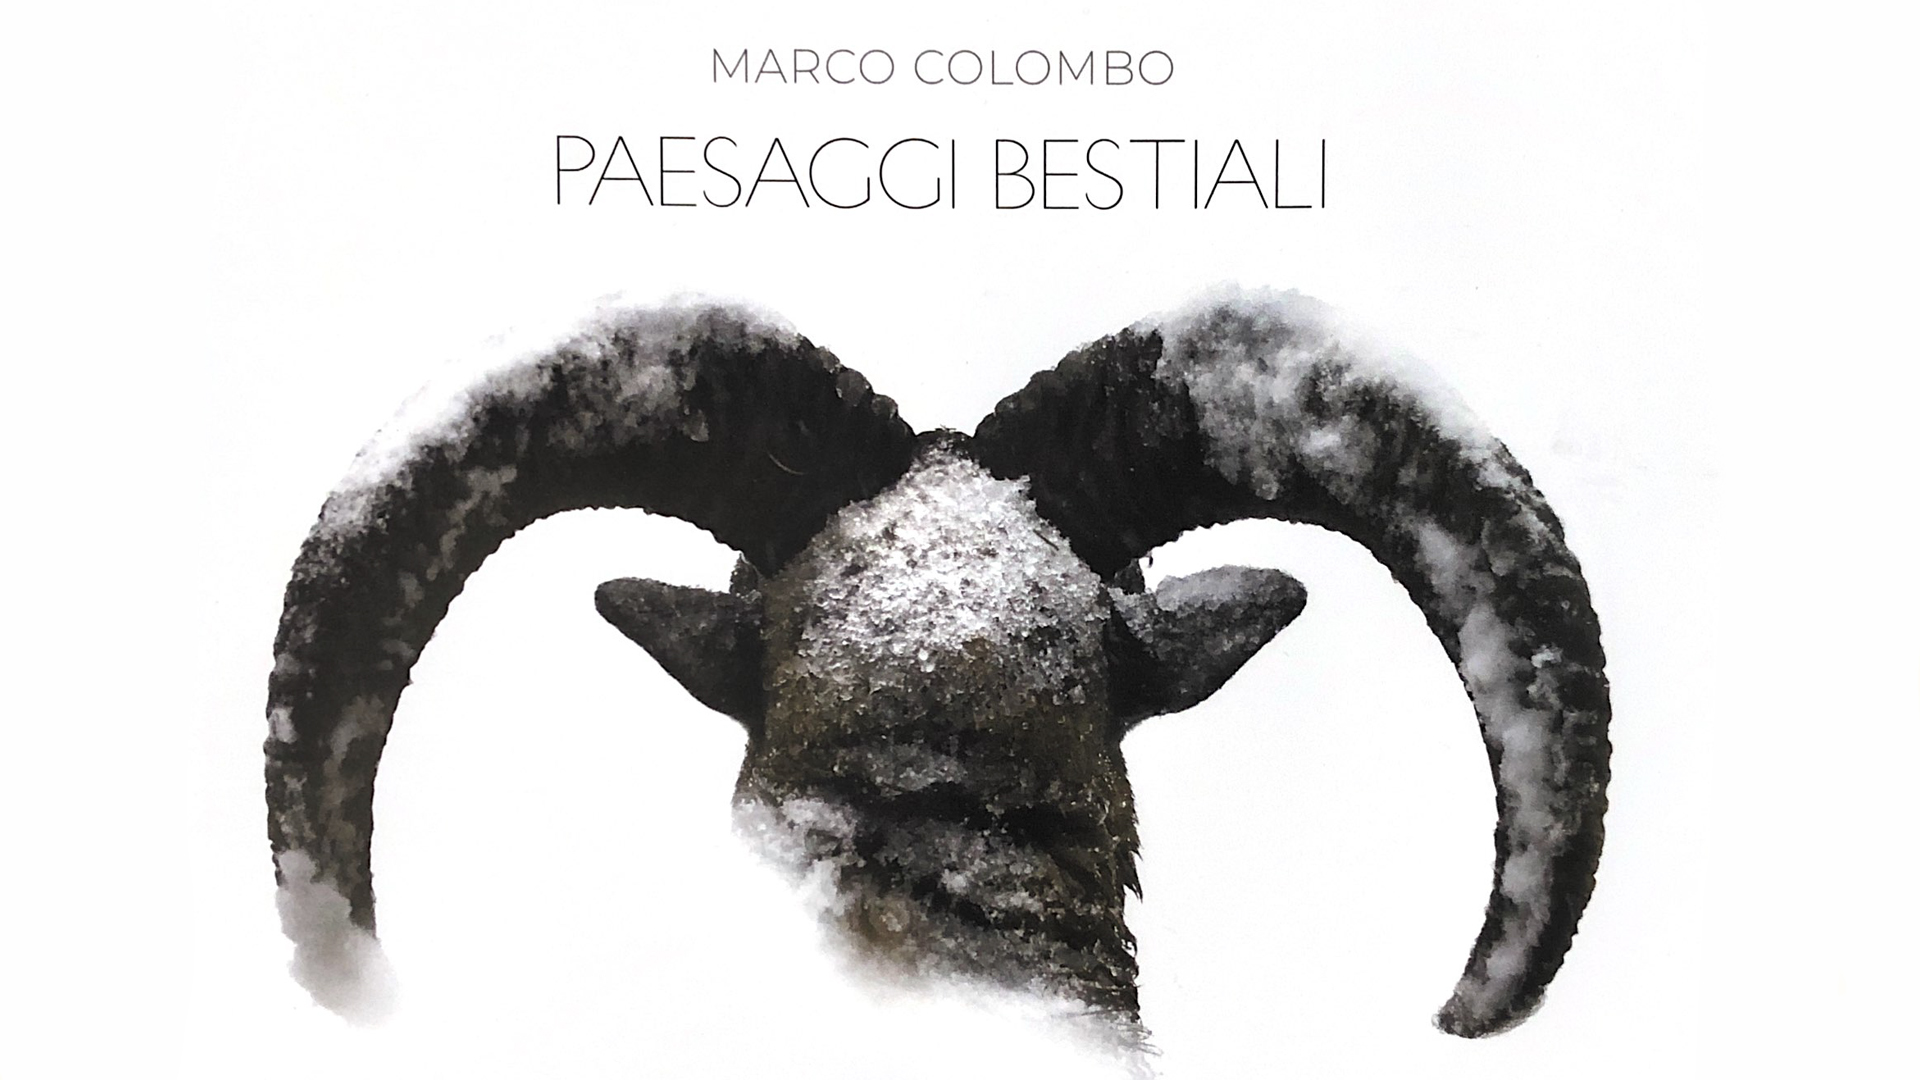 Marco Colombo - Paesaggi Bestiali